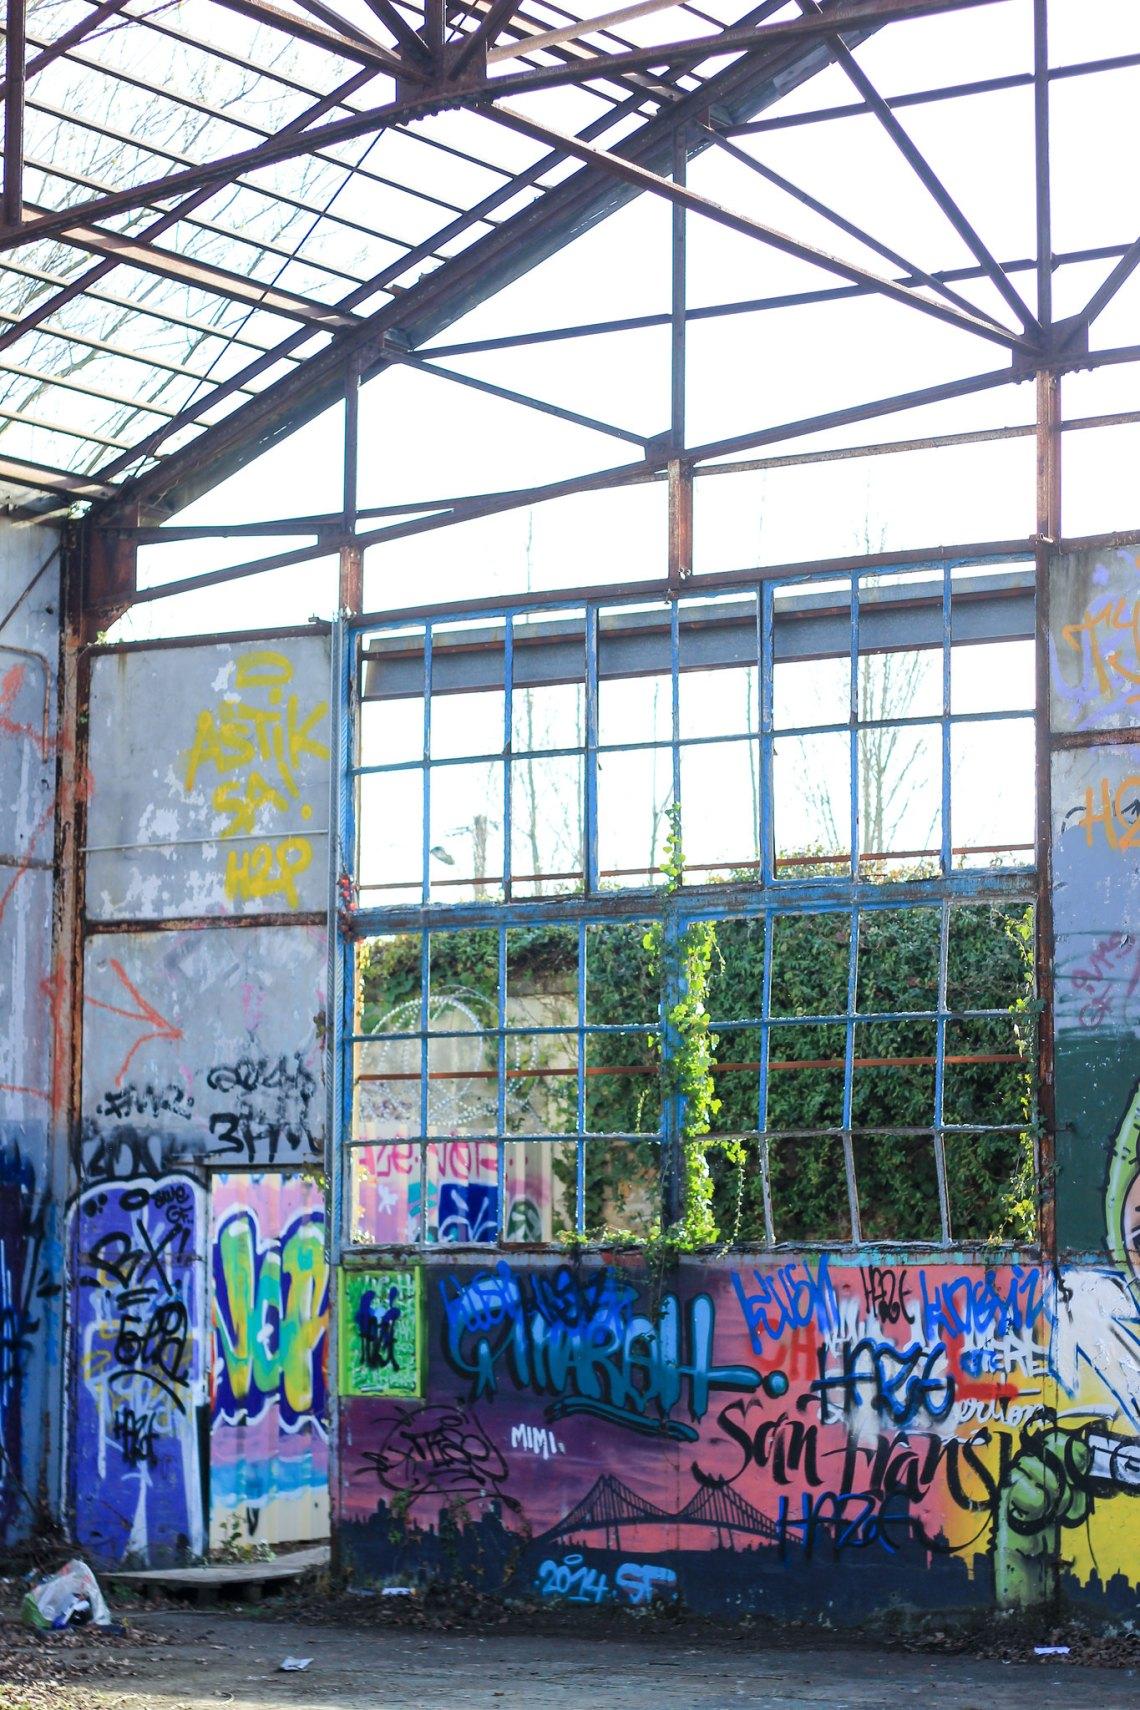 Street-art-bordeaux-darwon-eco-systeme